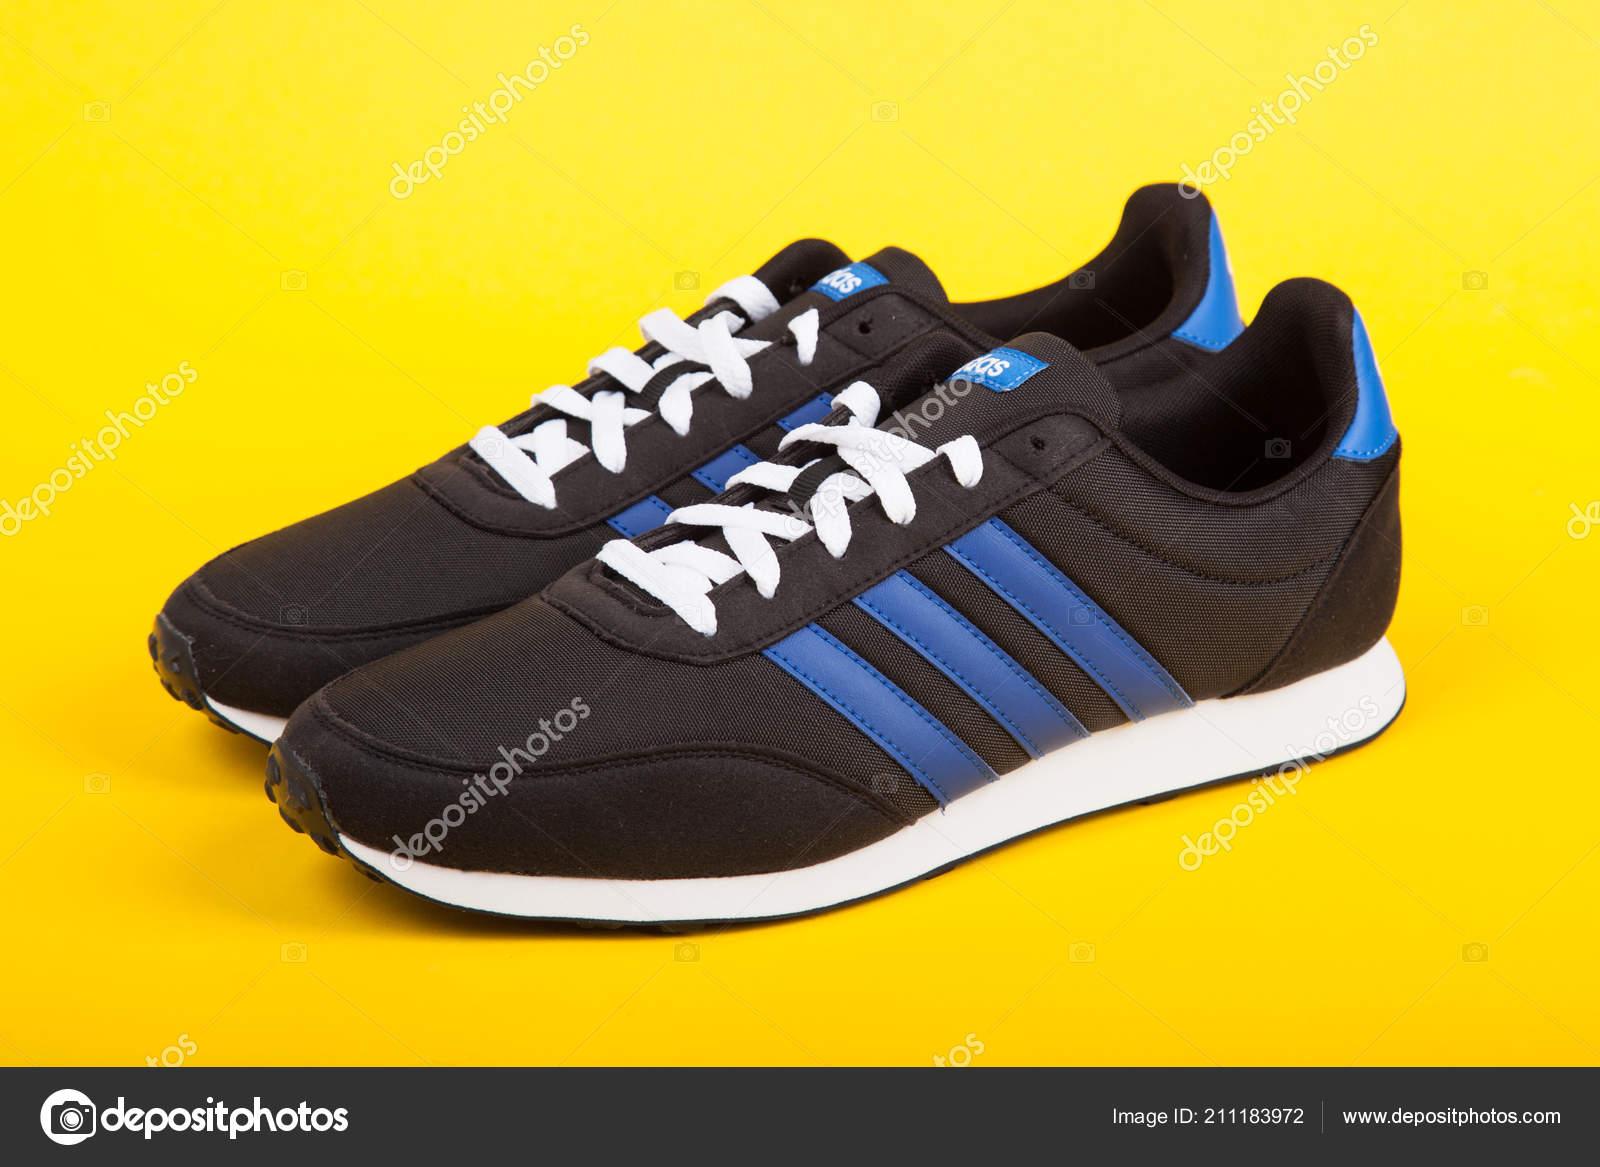 2a431aa1dde Βάρνα Βουλγαρία Ιουλίου 2018 Δρομέας Adidas Αθλητικά Παπούτσια ...